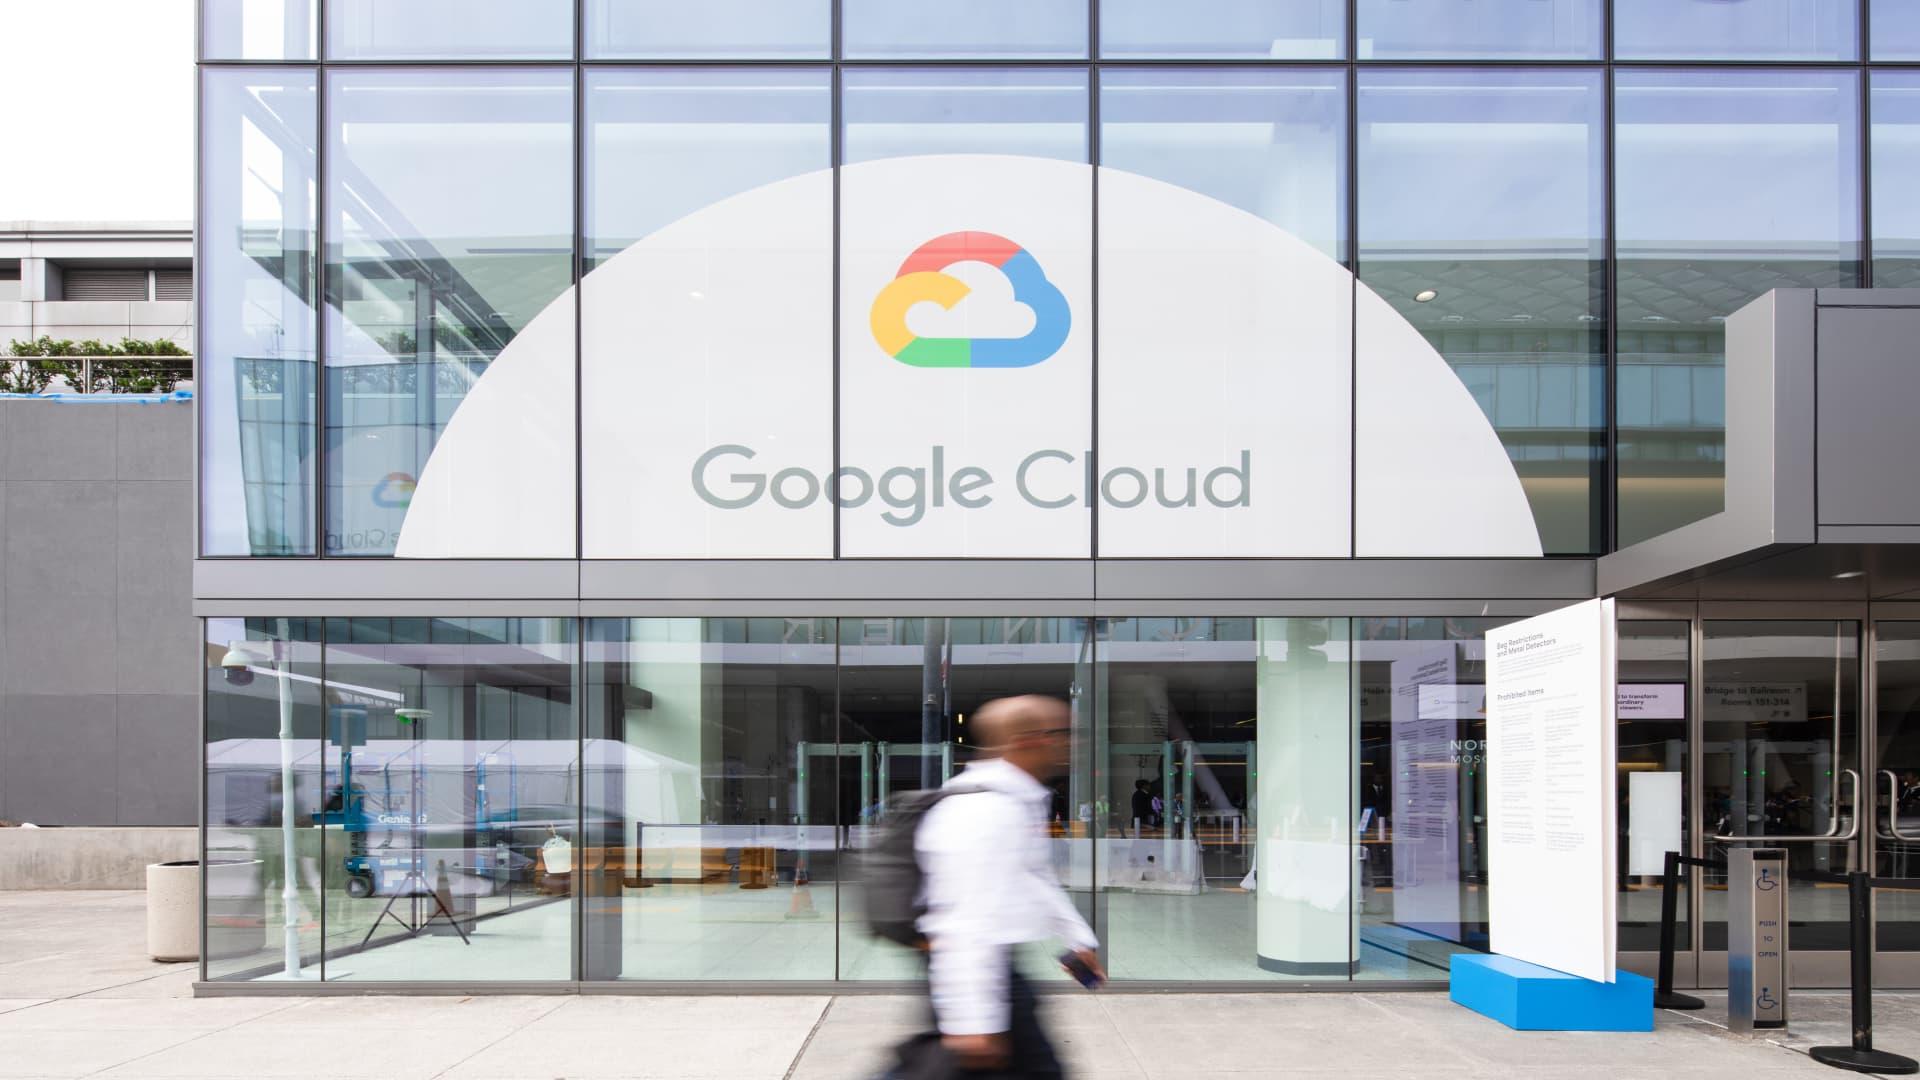 Google Cloud headquarters sits in Sunnyvale, California.